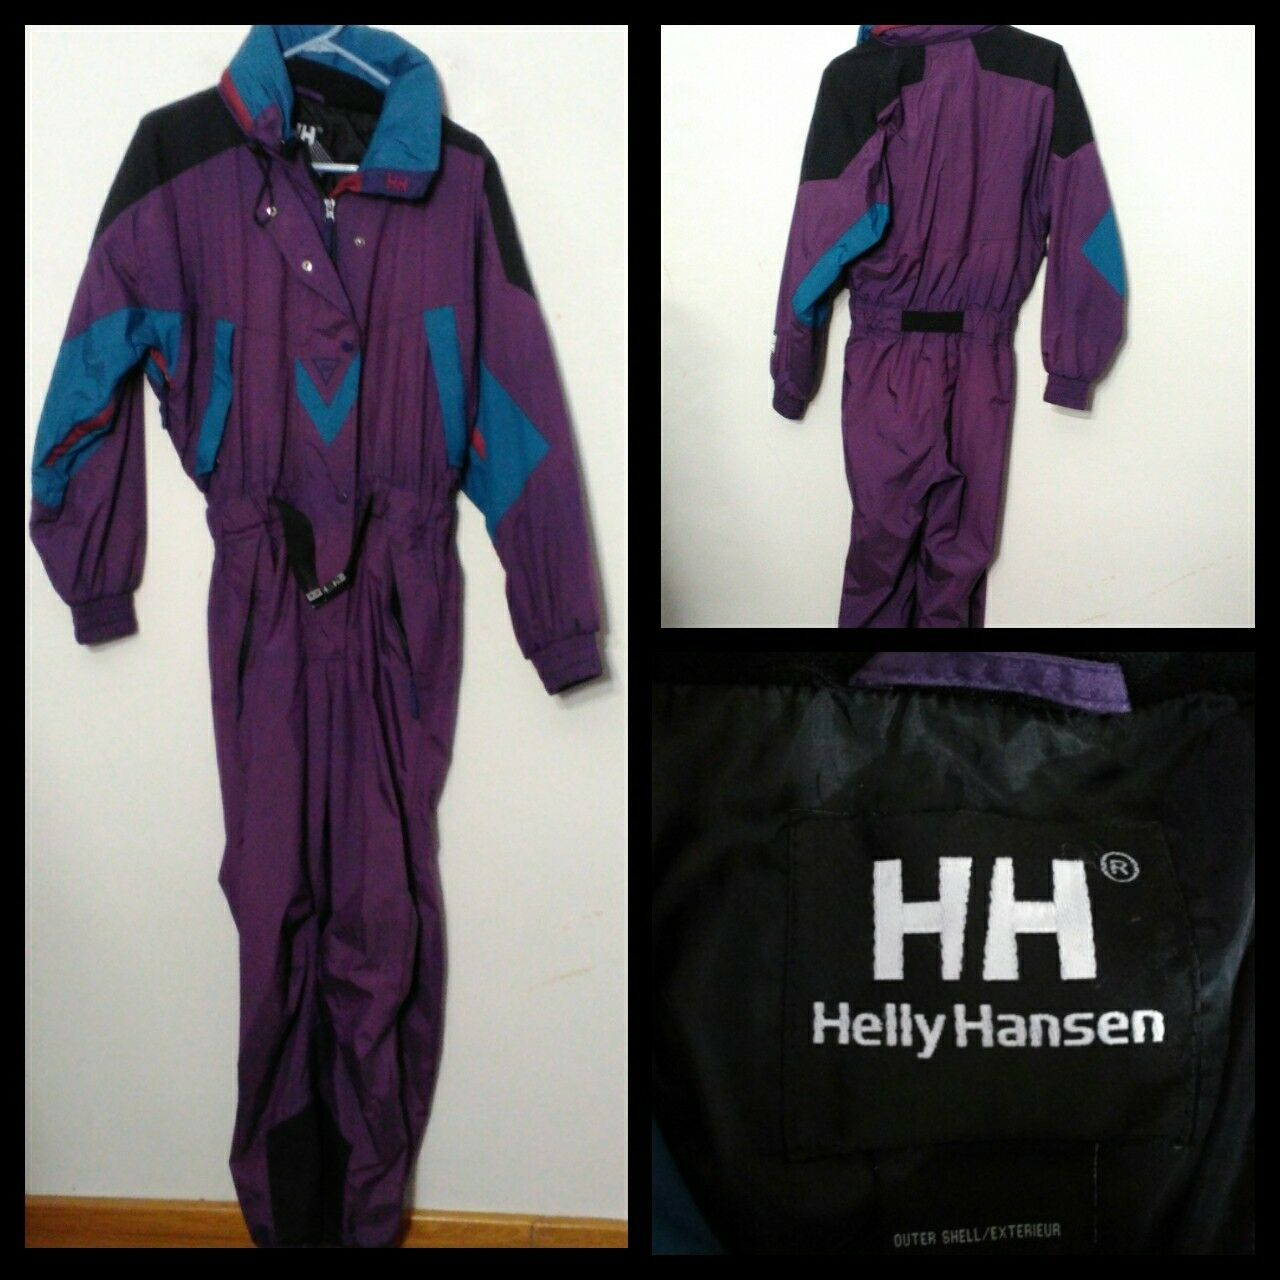 Helly Hansen Vintage Skianzug Damen Sm. Lila/Blau S9279 Voll Ski Outfit Inv  S9279 Lila/Blau cb79a5